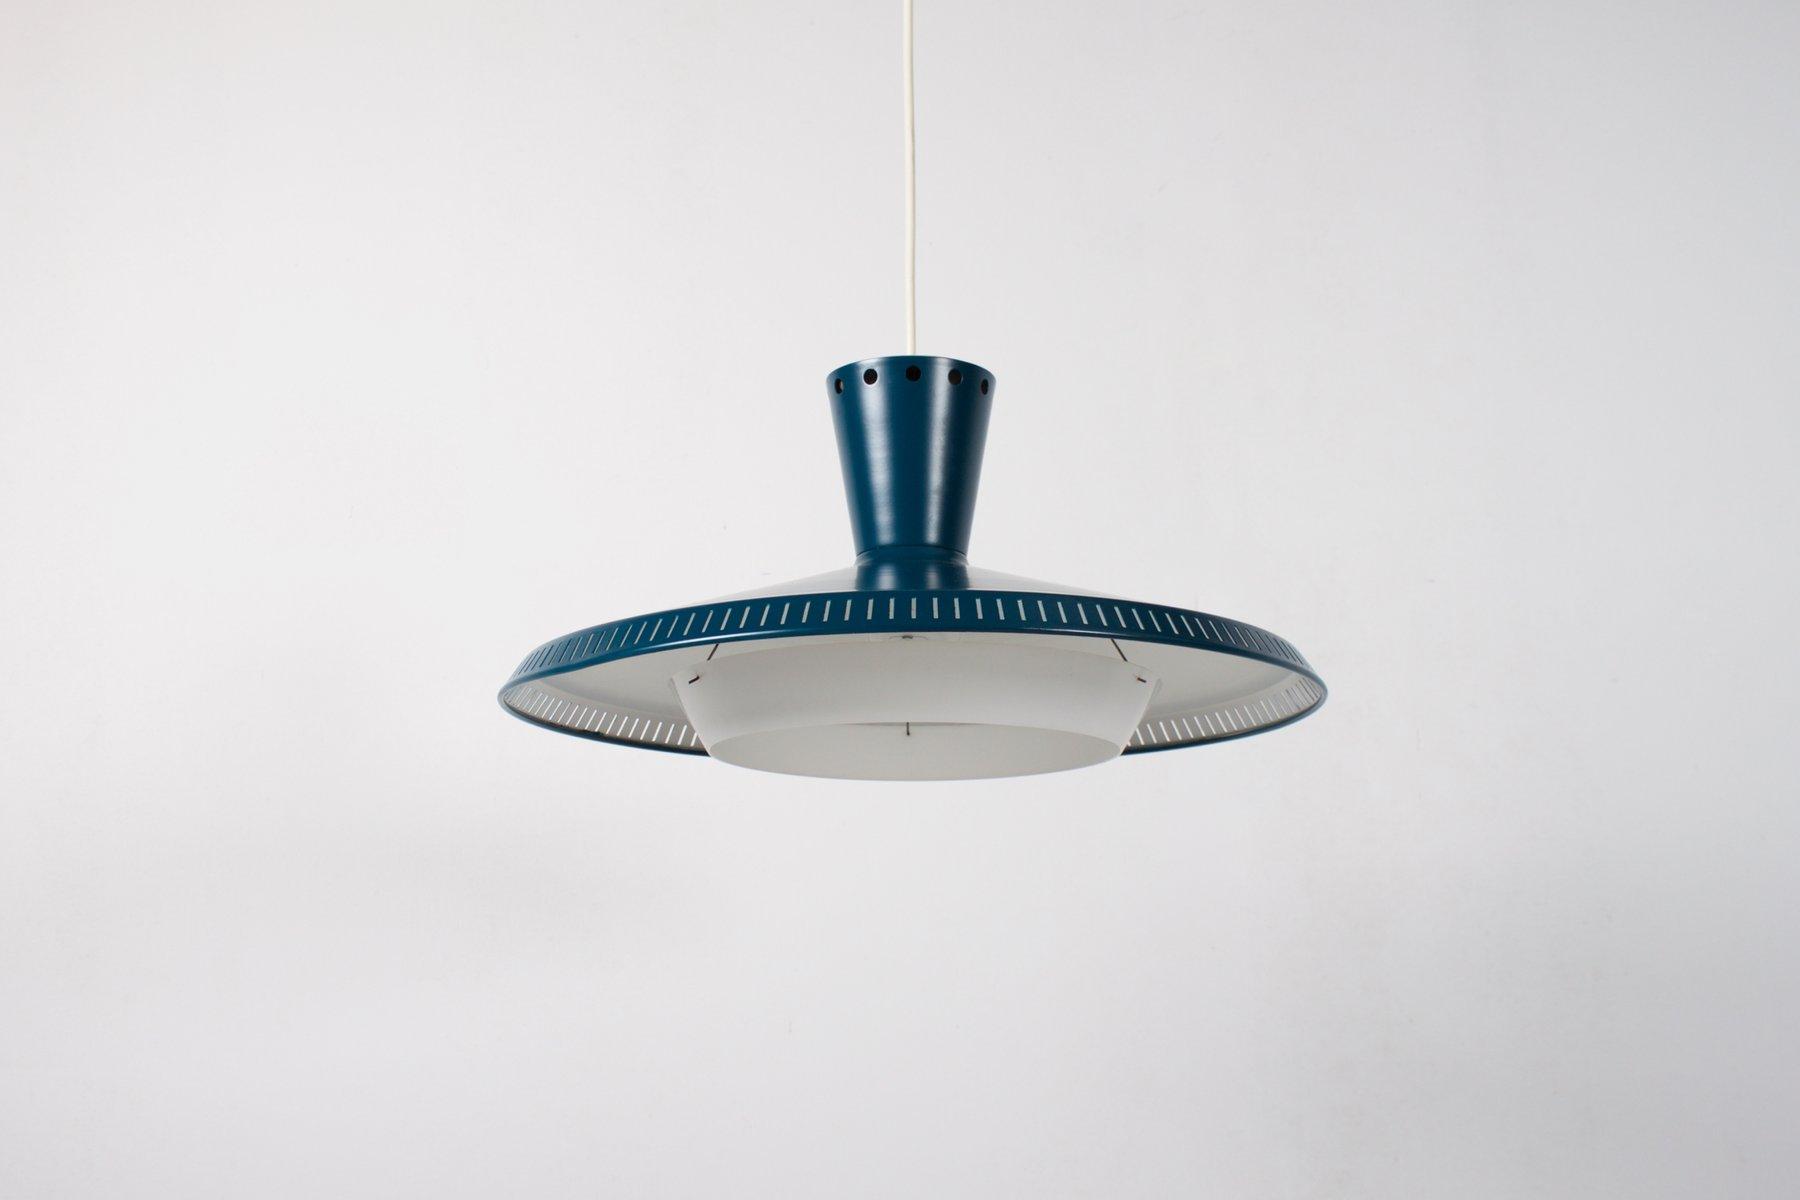 Plafoniere Industriali Led Philips : Lampadario sospensione philips lampada a led